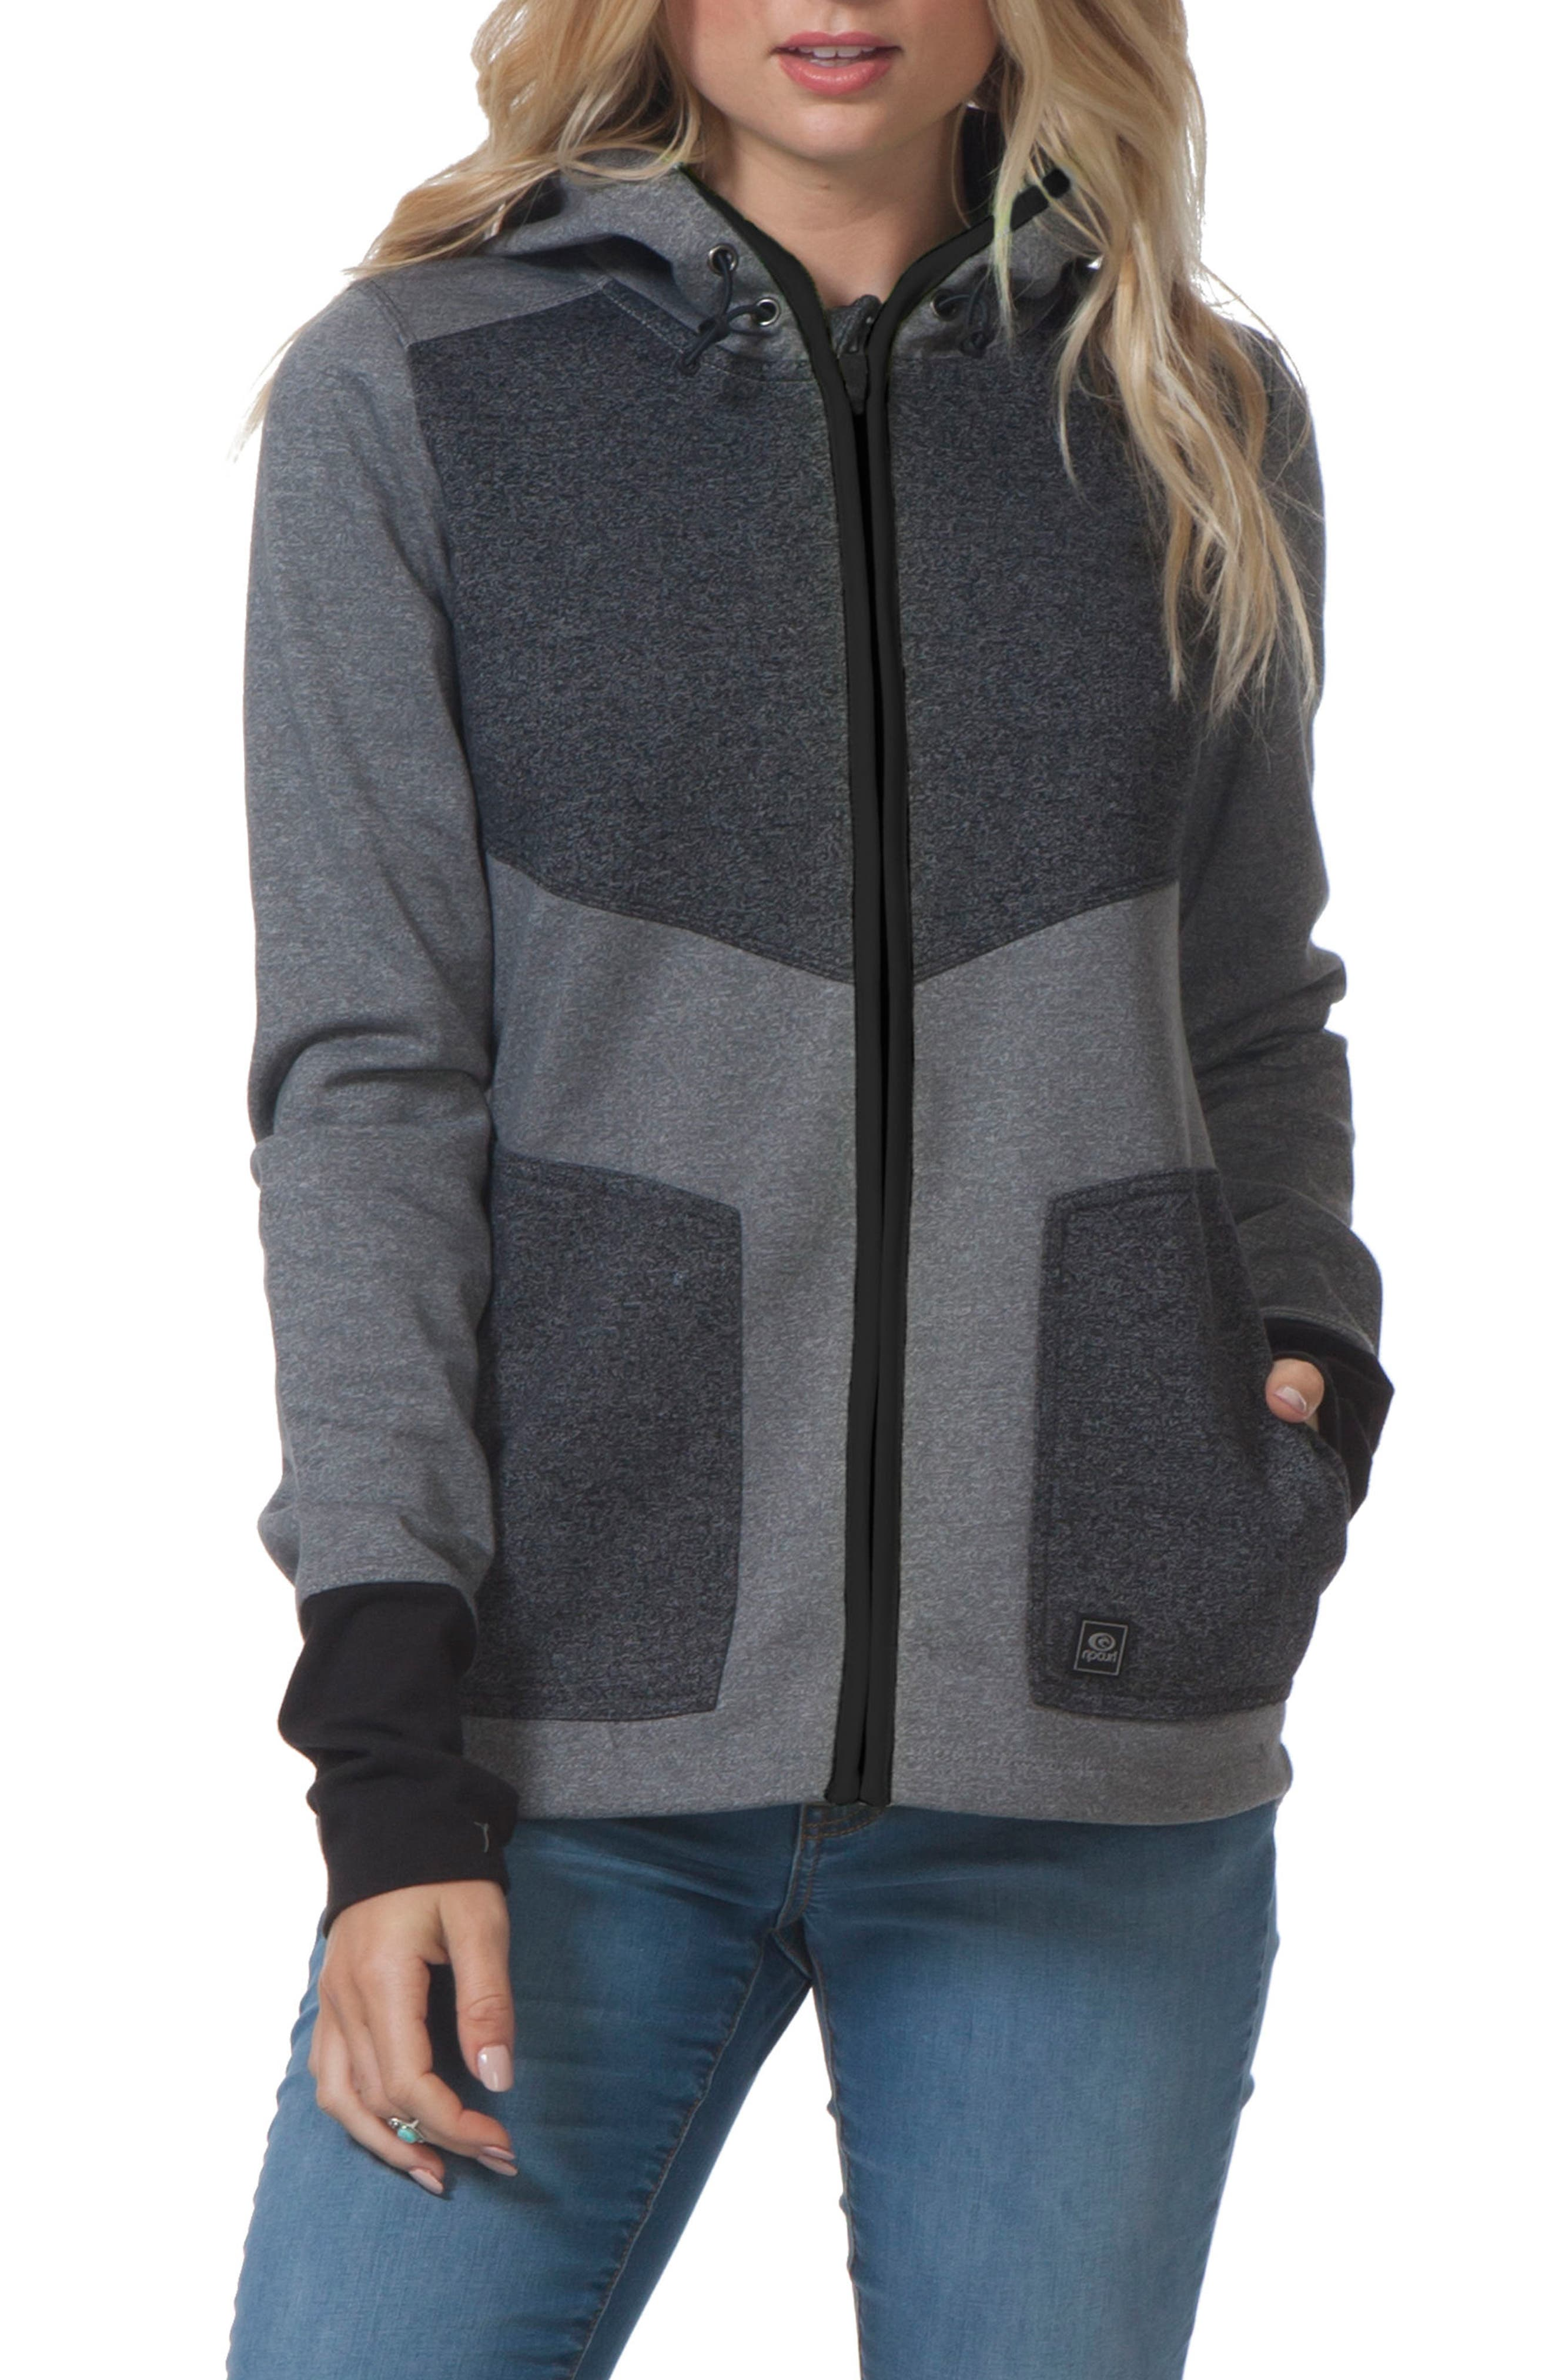 Espy Anti Series Hooded Jacket,                             Main thumbnail 1, color,                             020